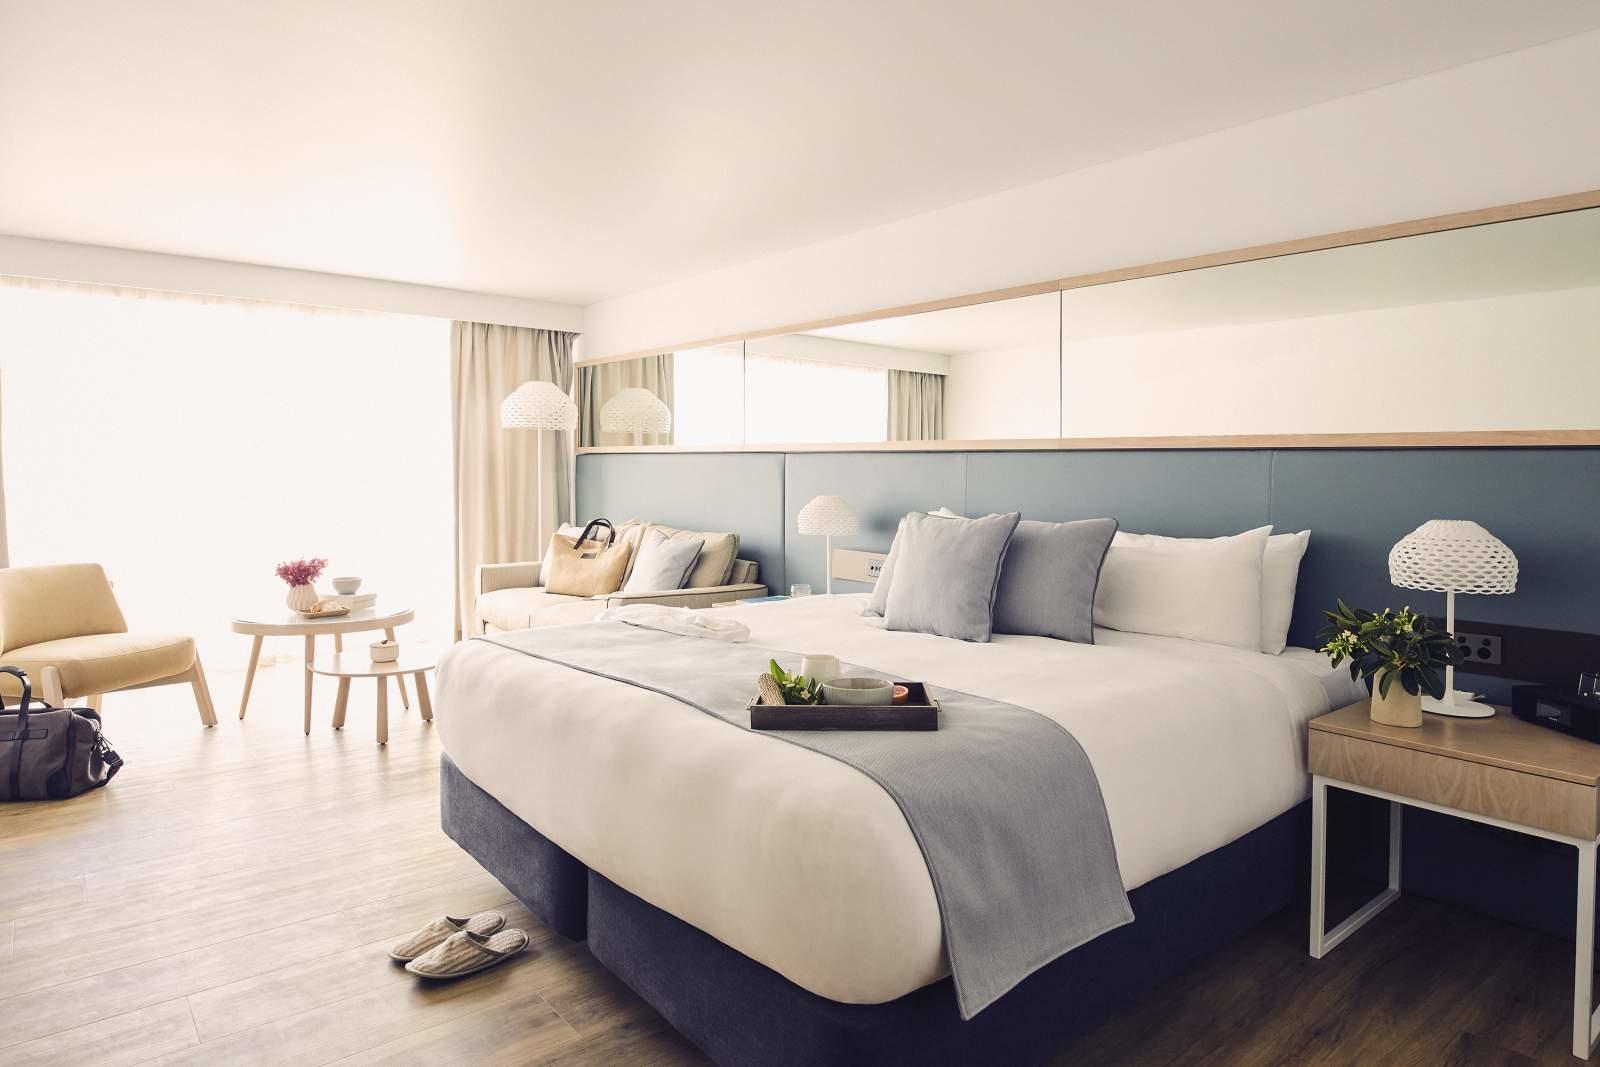 Room at Daydream Island resort